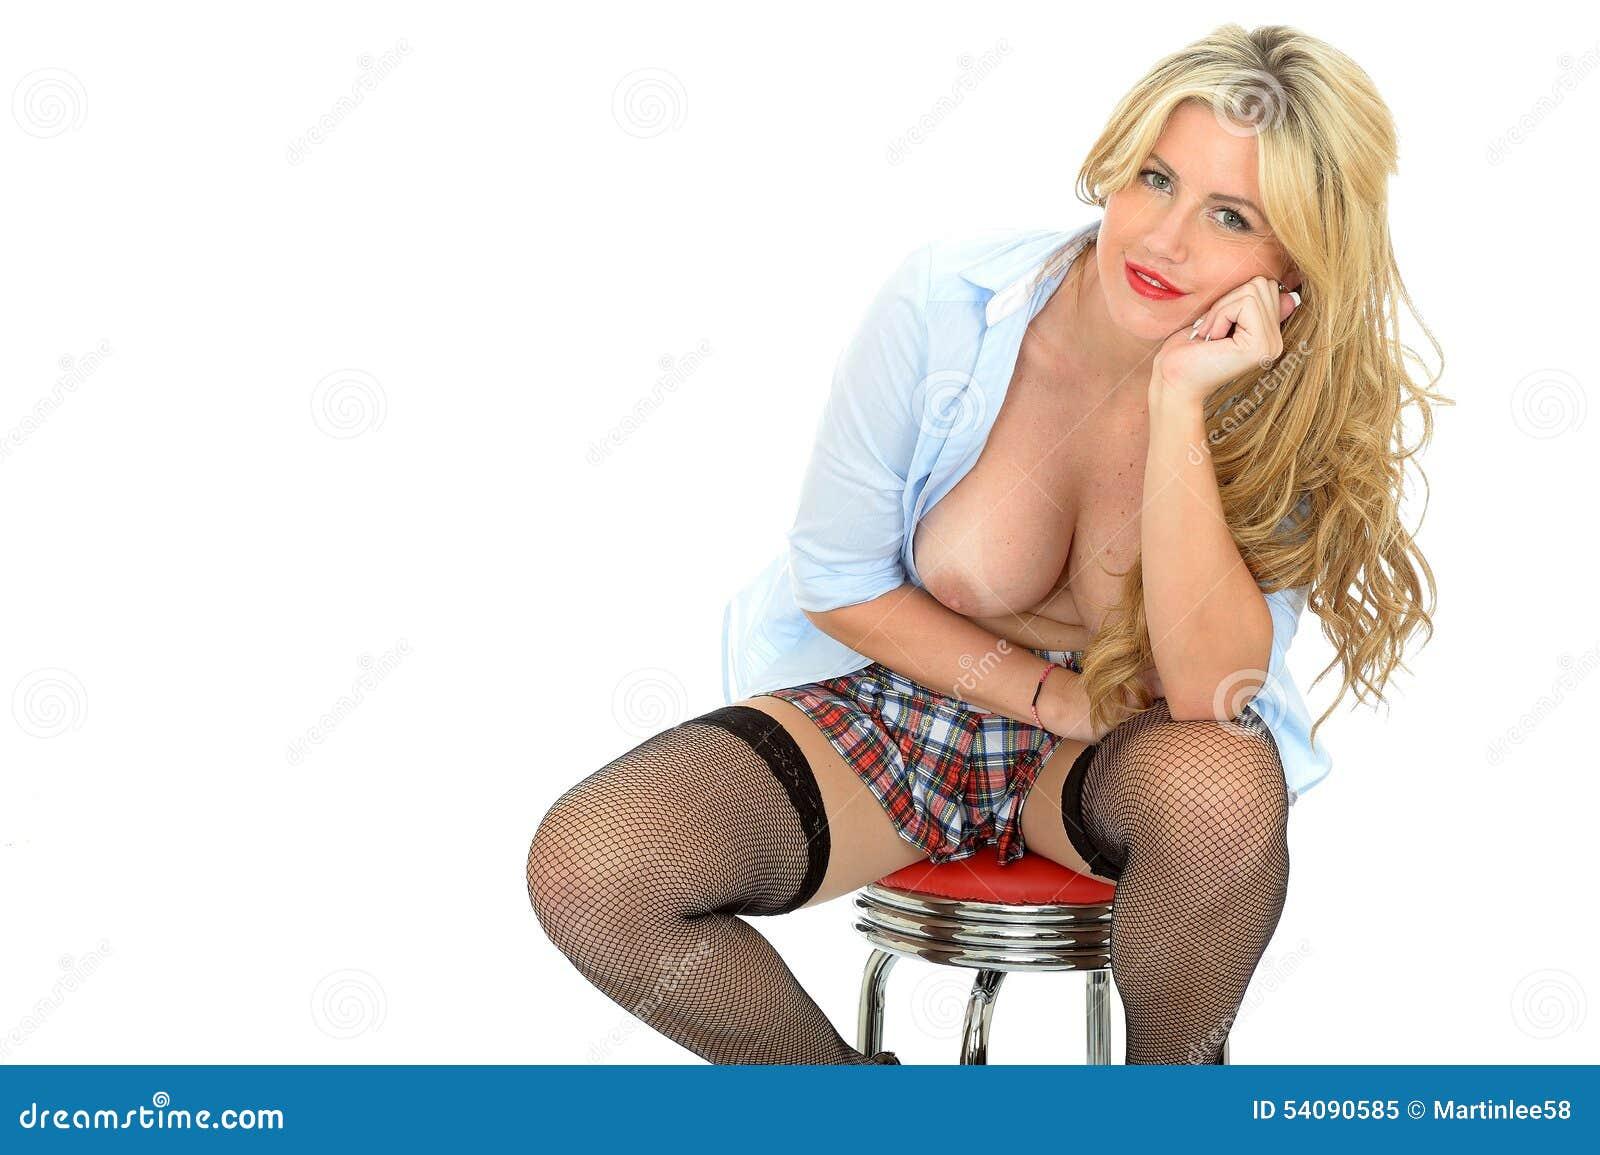 Bella giovane bionda classica flirt insolente sexy Pin Up Model Posing Topless